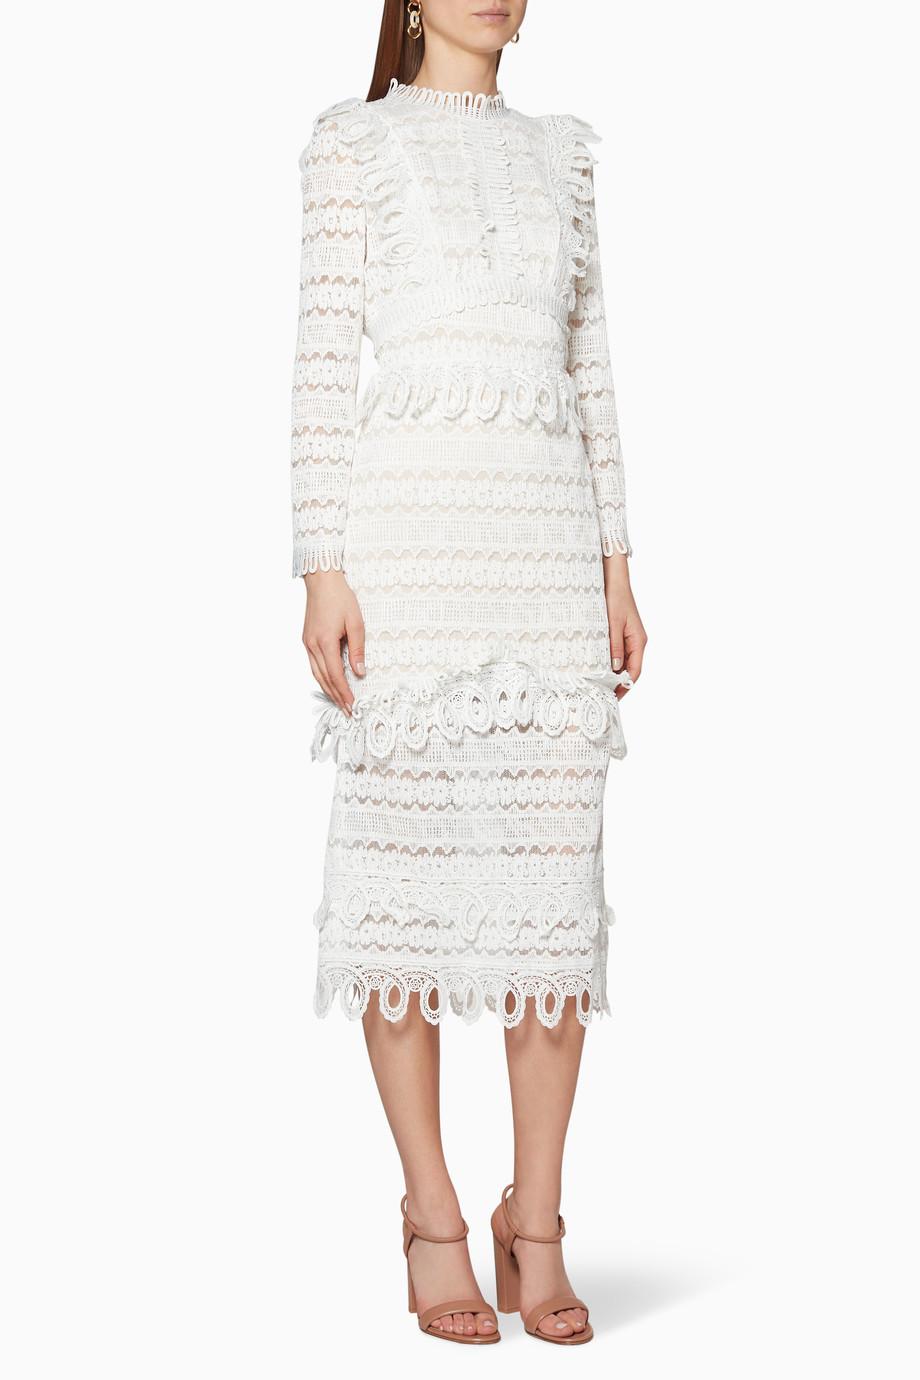 5e096312aae29 Shop Elliatt White Clover Lace Dress for Women   Ounass UAE